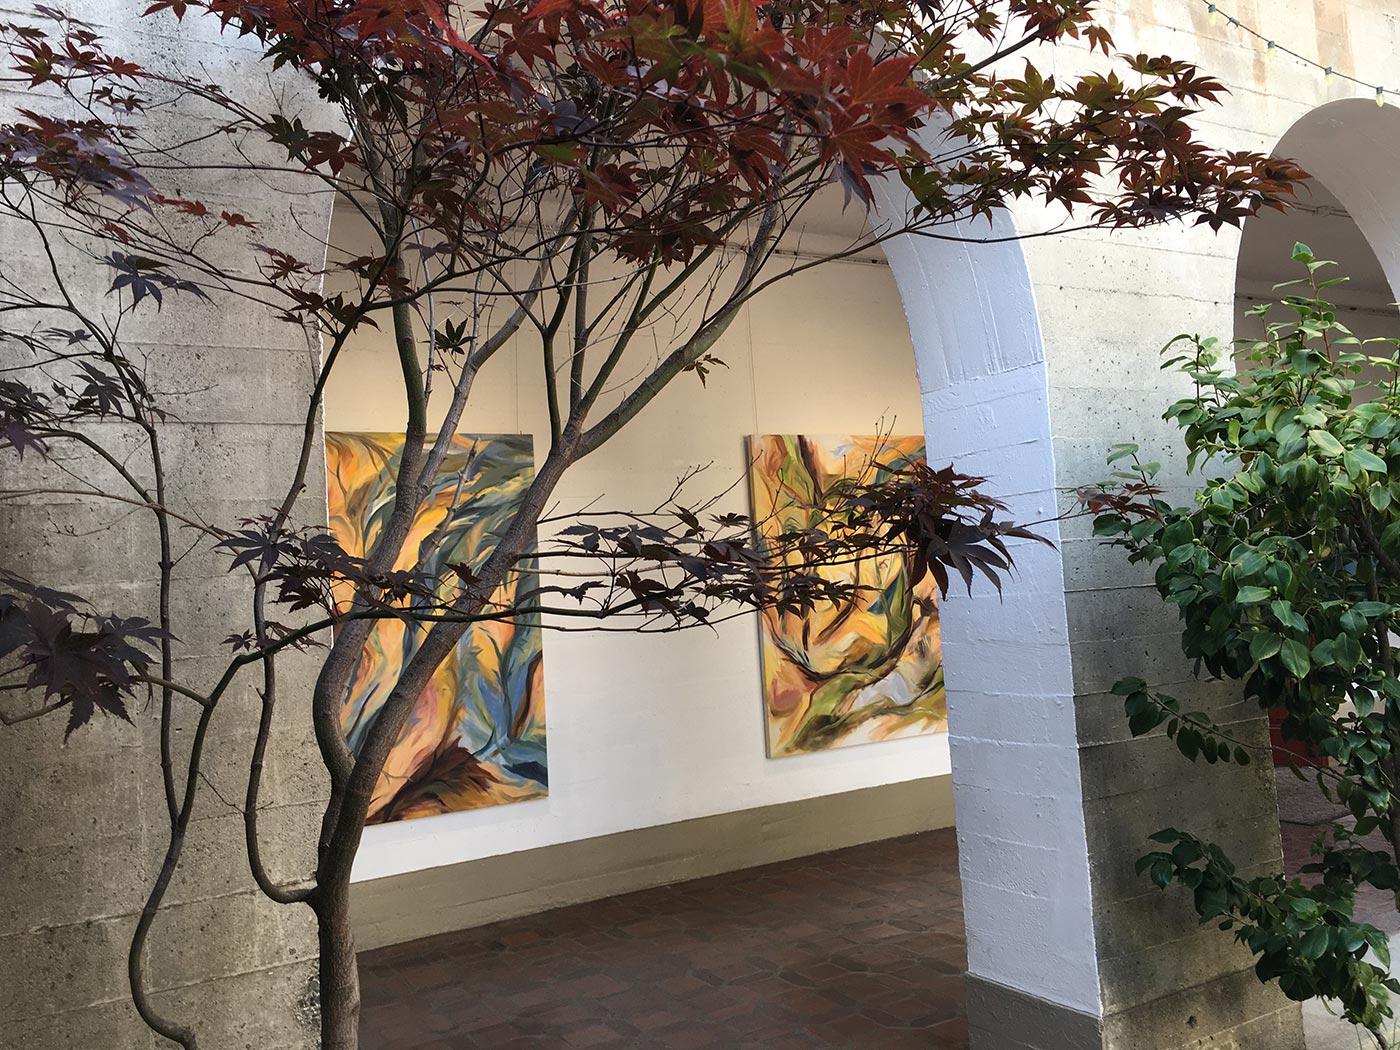 San Francisco Art Institute, Chestnut